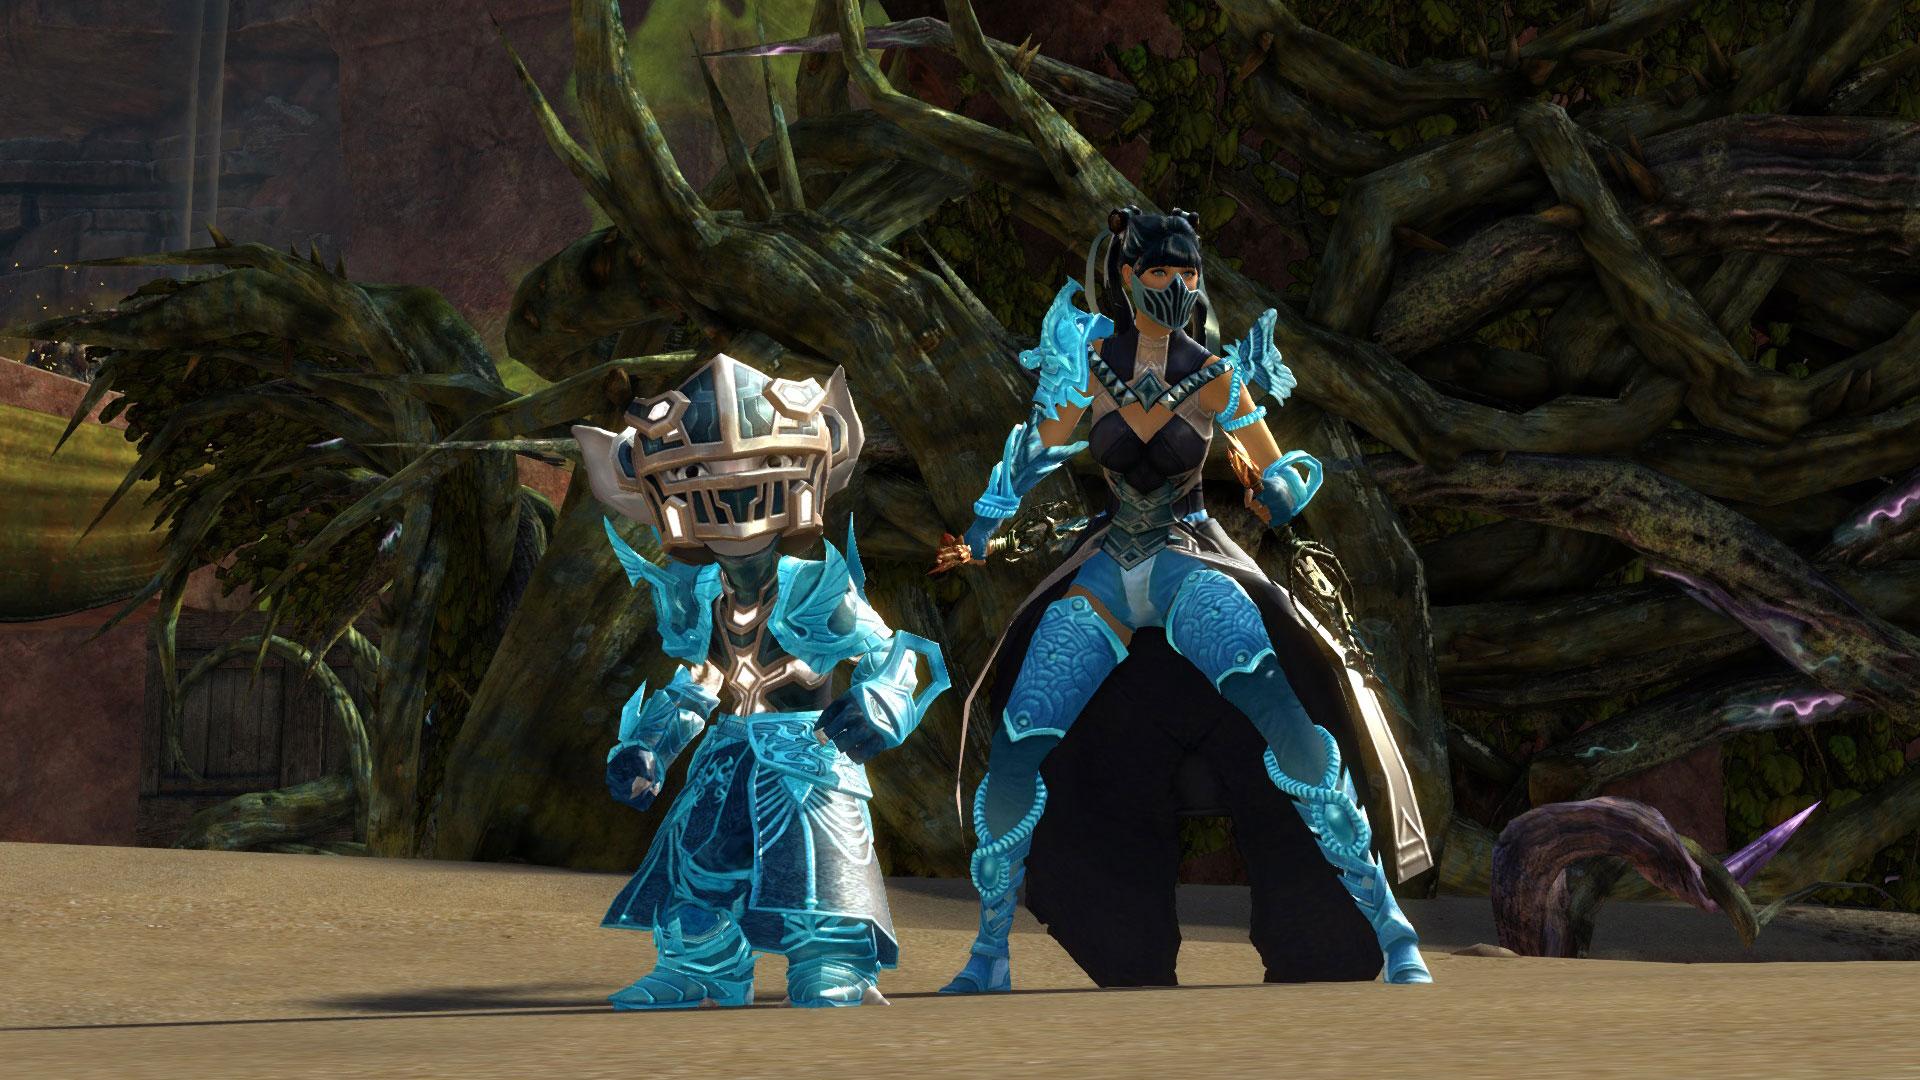 guild wars 2 screenshot gay